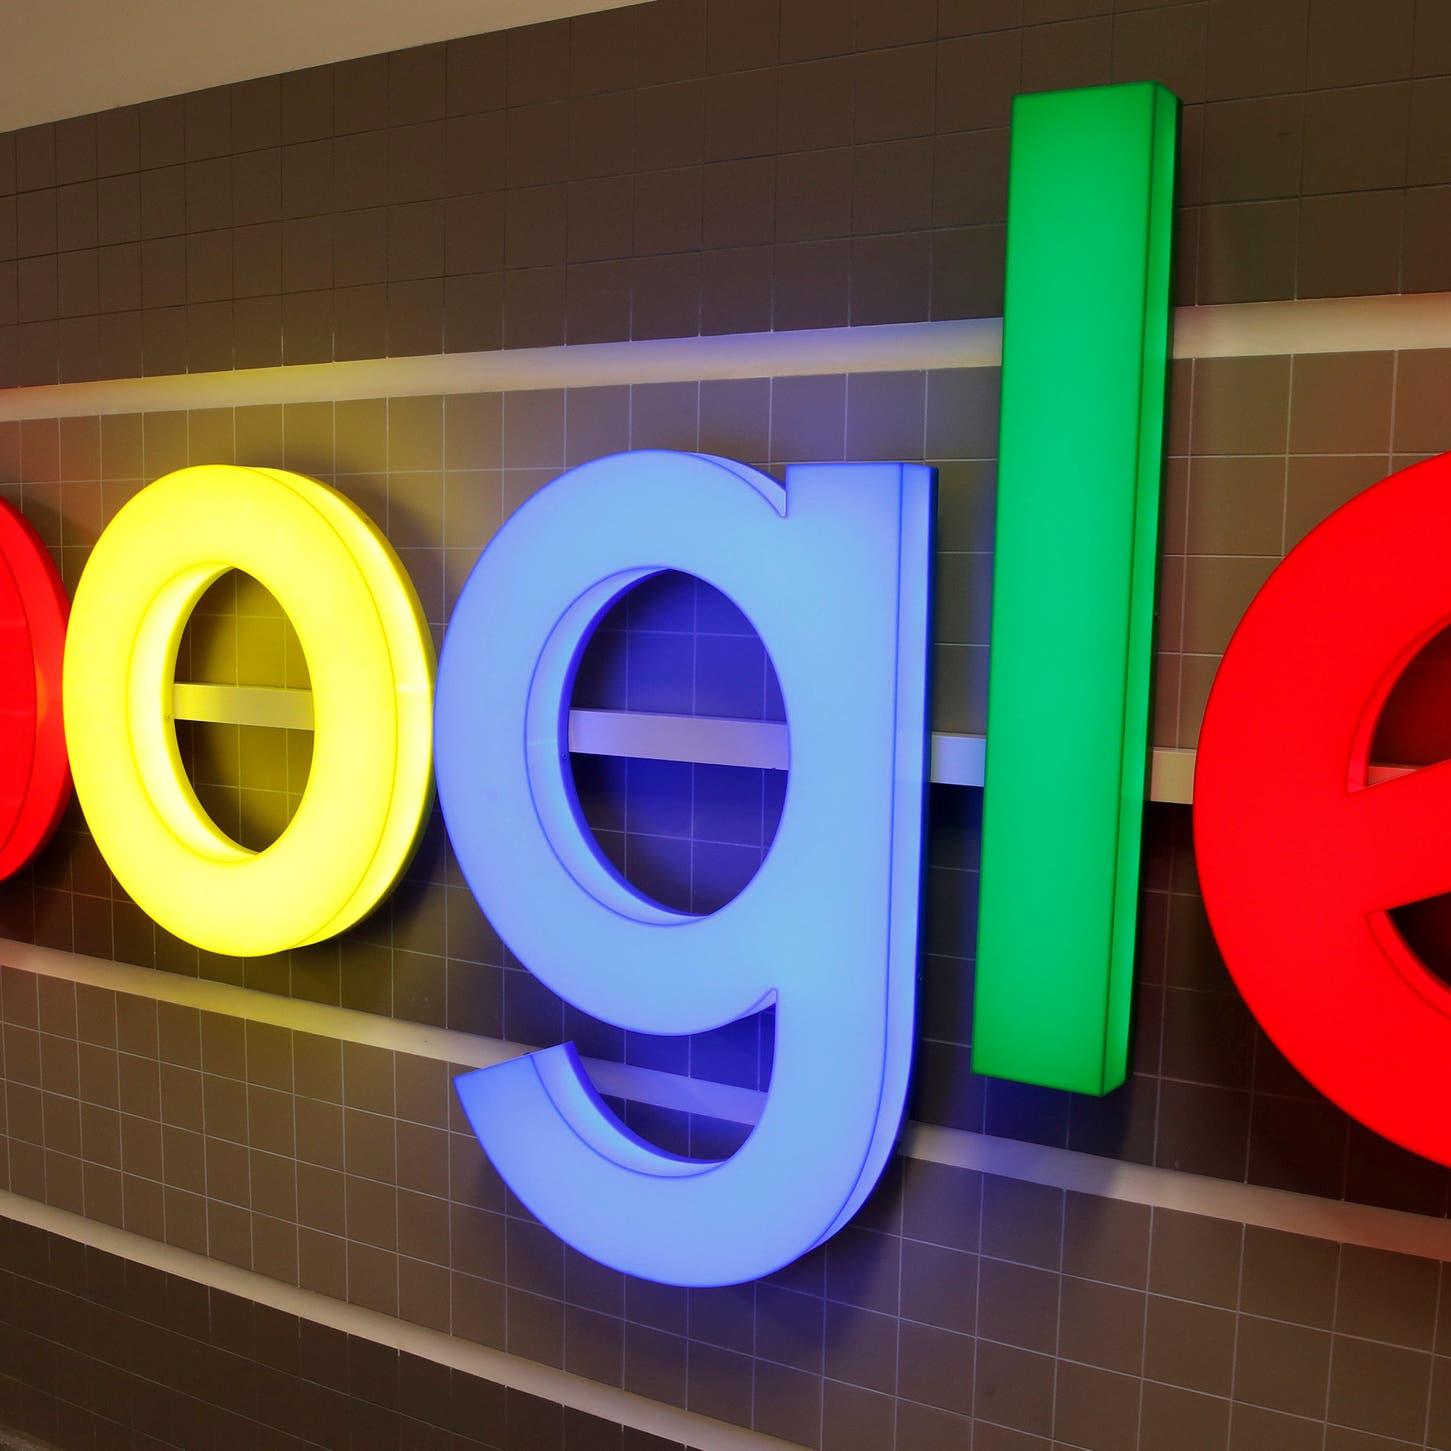 "غوغل تُكثّف حملتها وتزيل 6 ملايين ""إعلان سيئ"" يومياً"